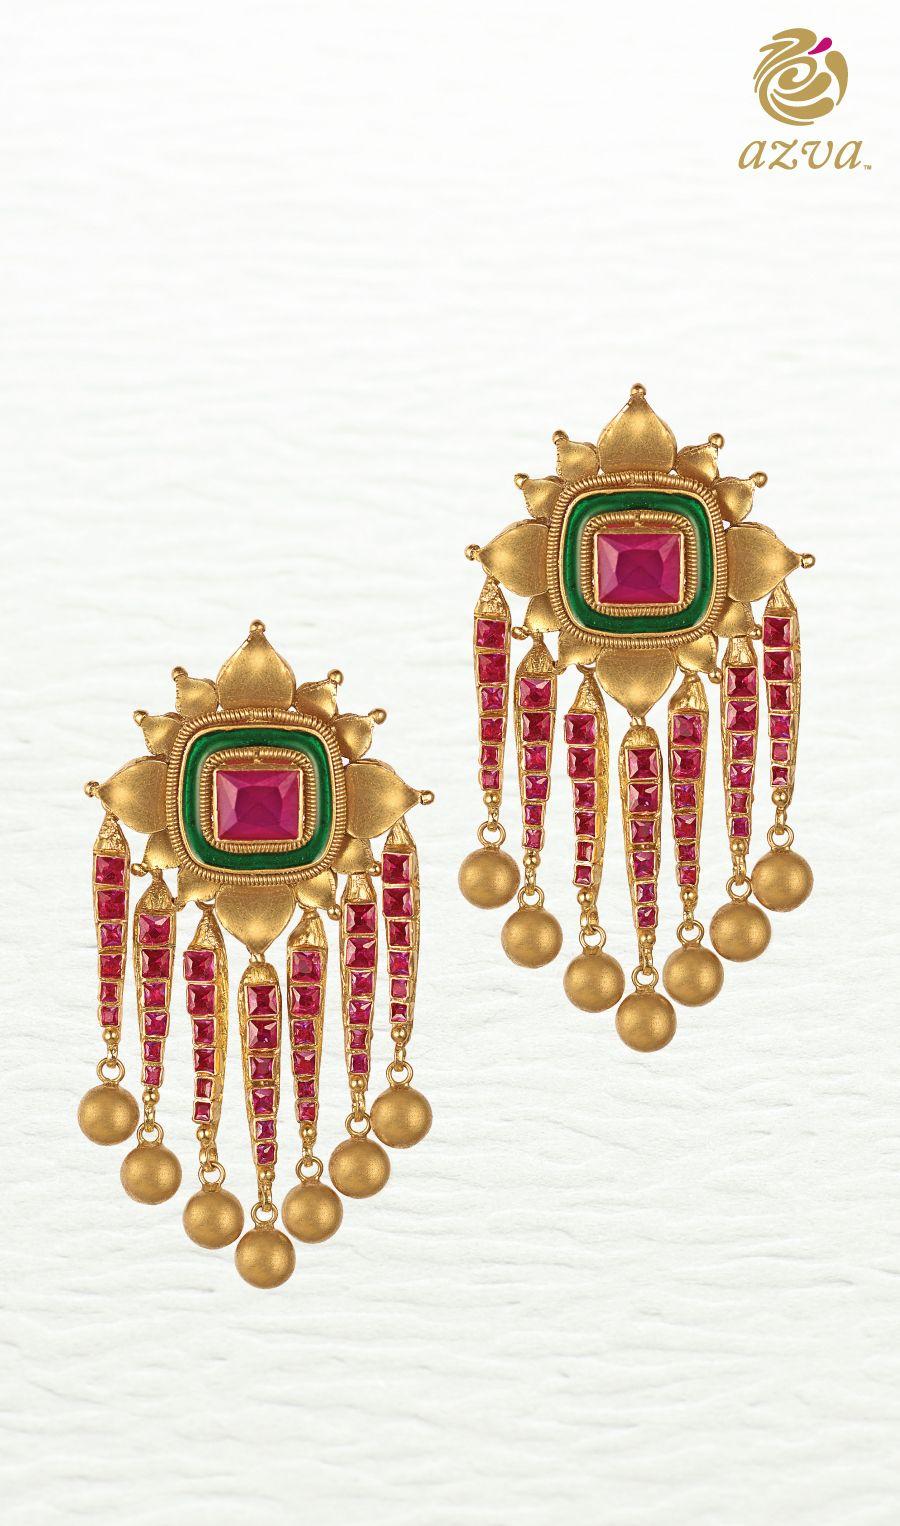 Bridal Gold Earrings With Stones And Enamel Metal Jewellery Diamond Gems Jewelry